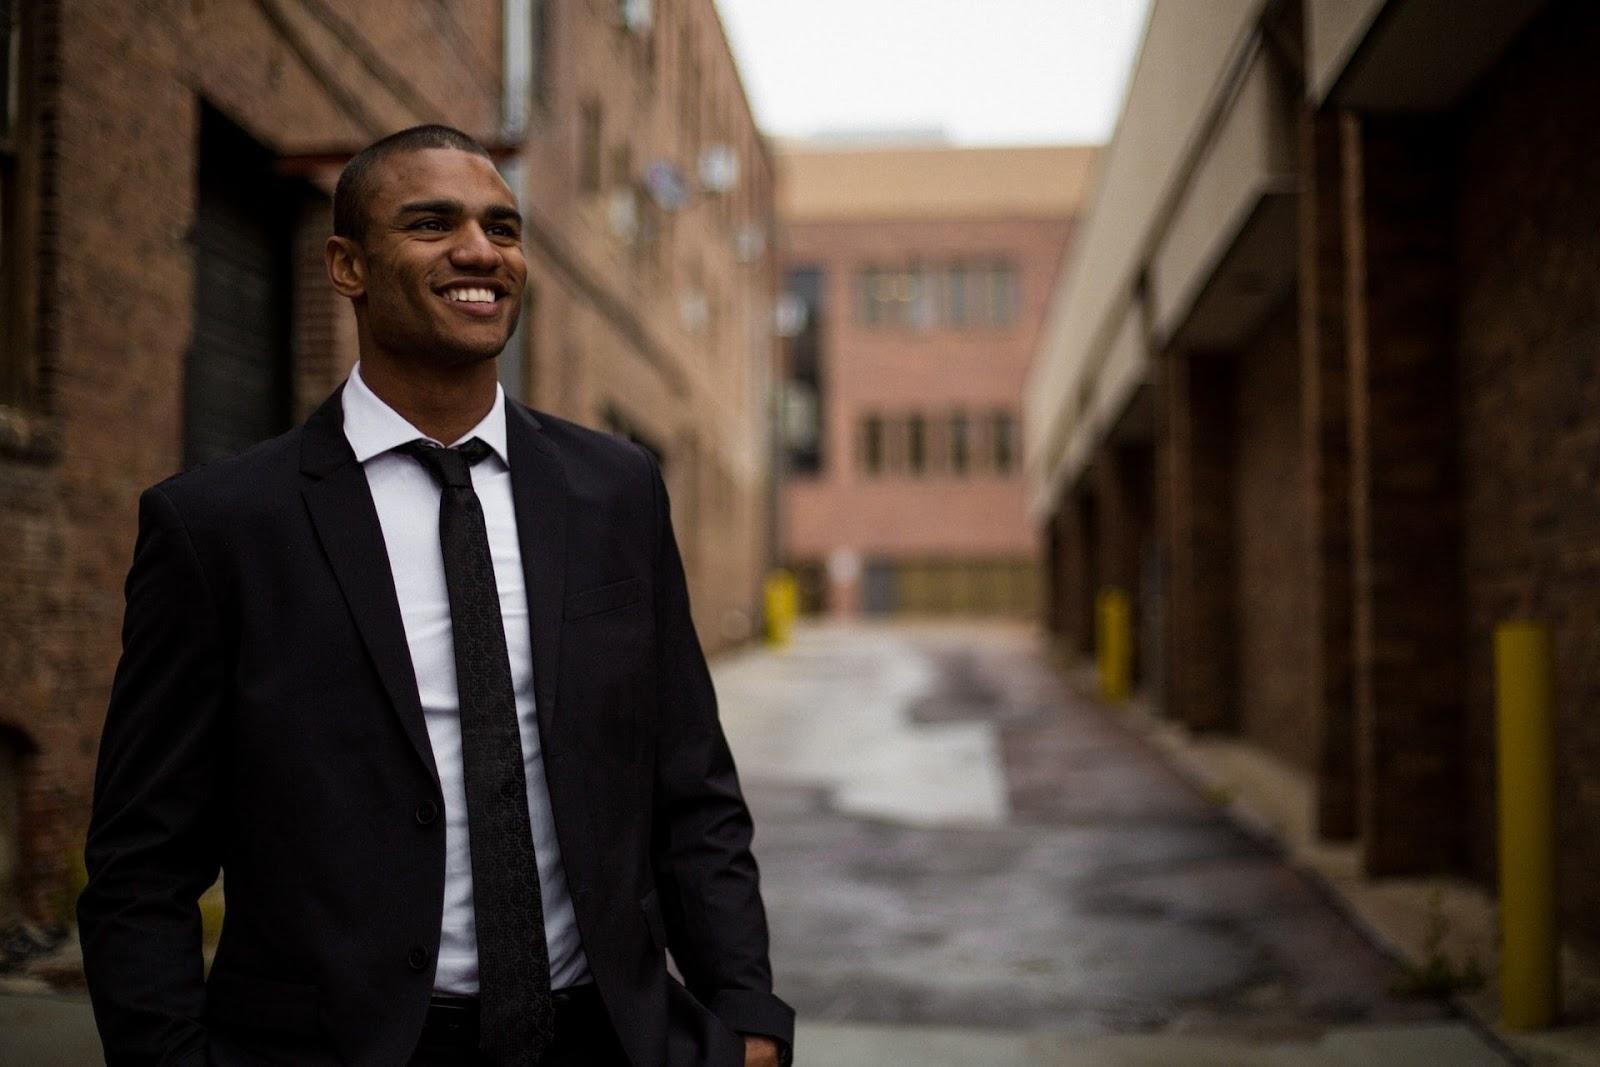 Man in suit smiling pass bar exam